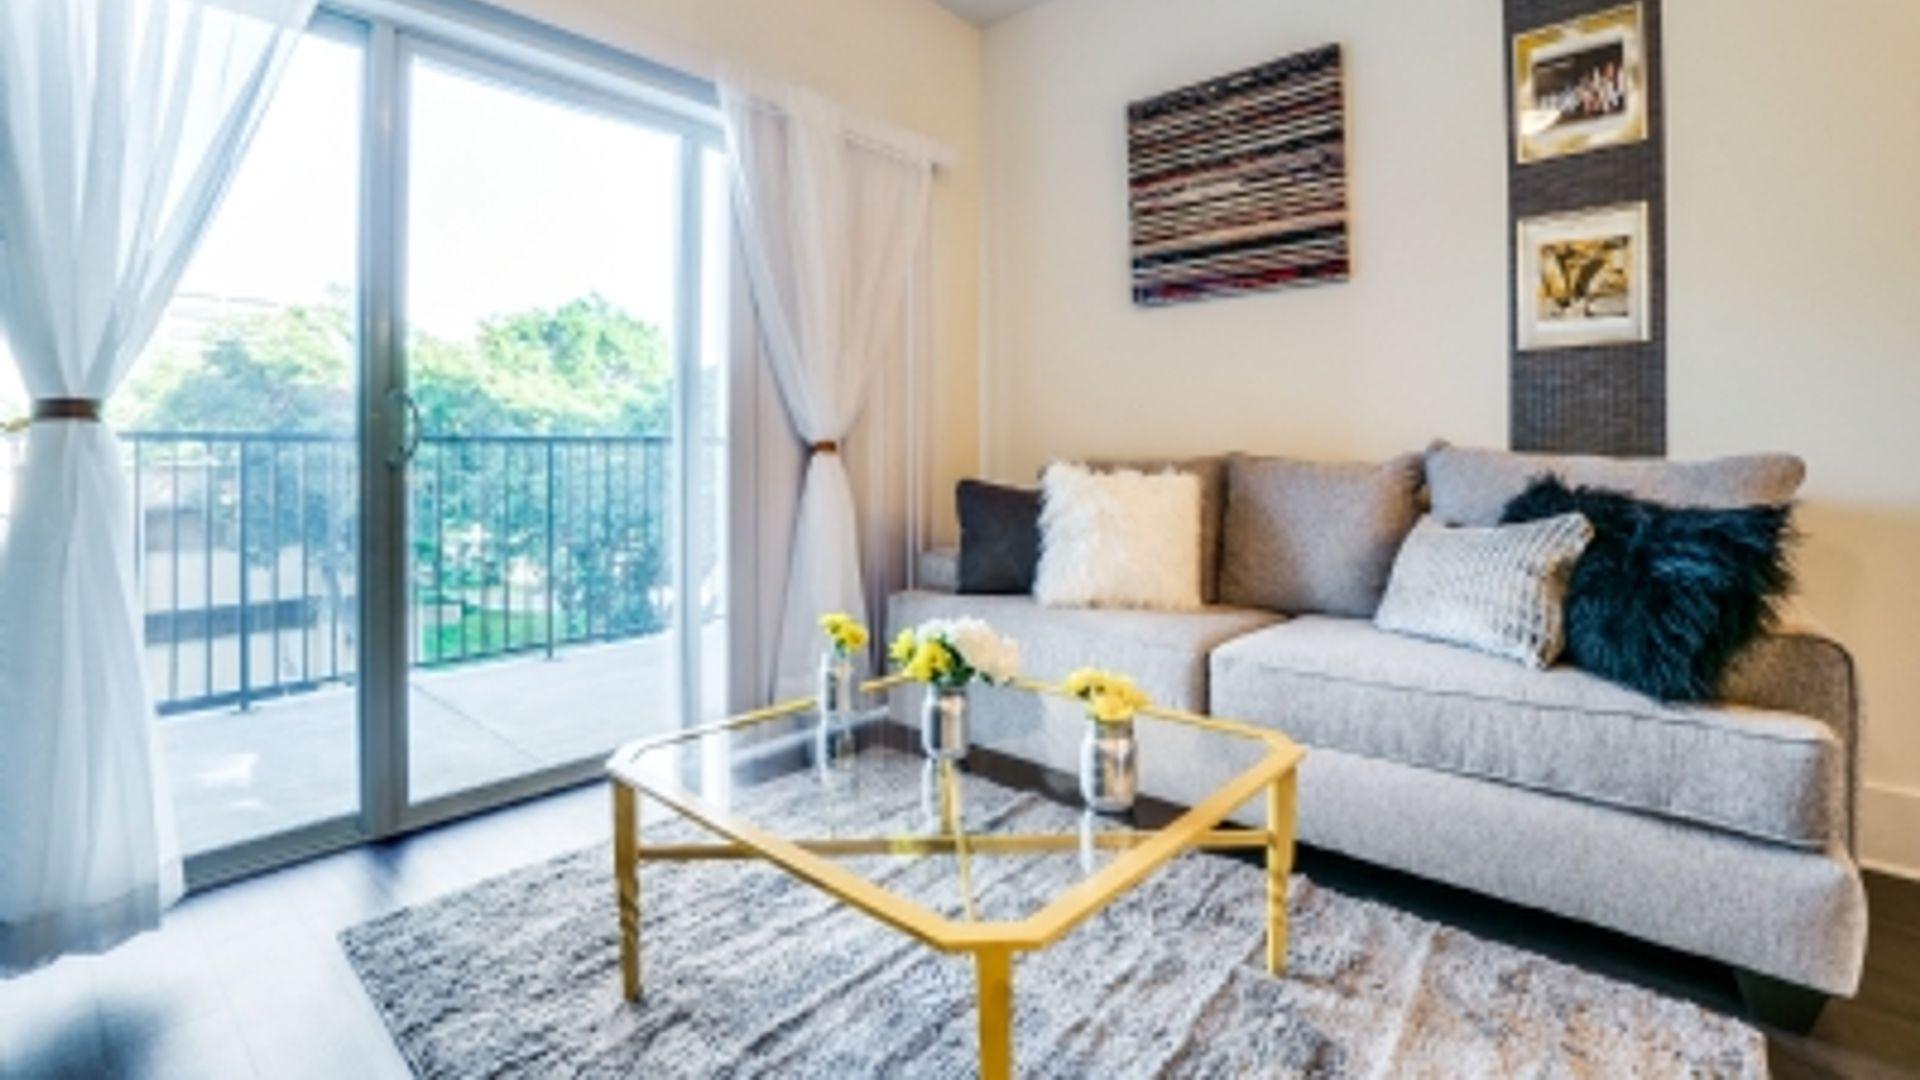 1 bed apartment at 8277 walnut hill lane dallas tx 75231